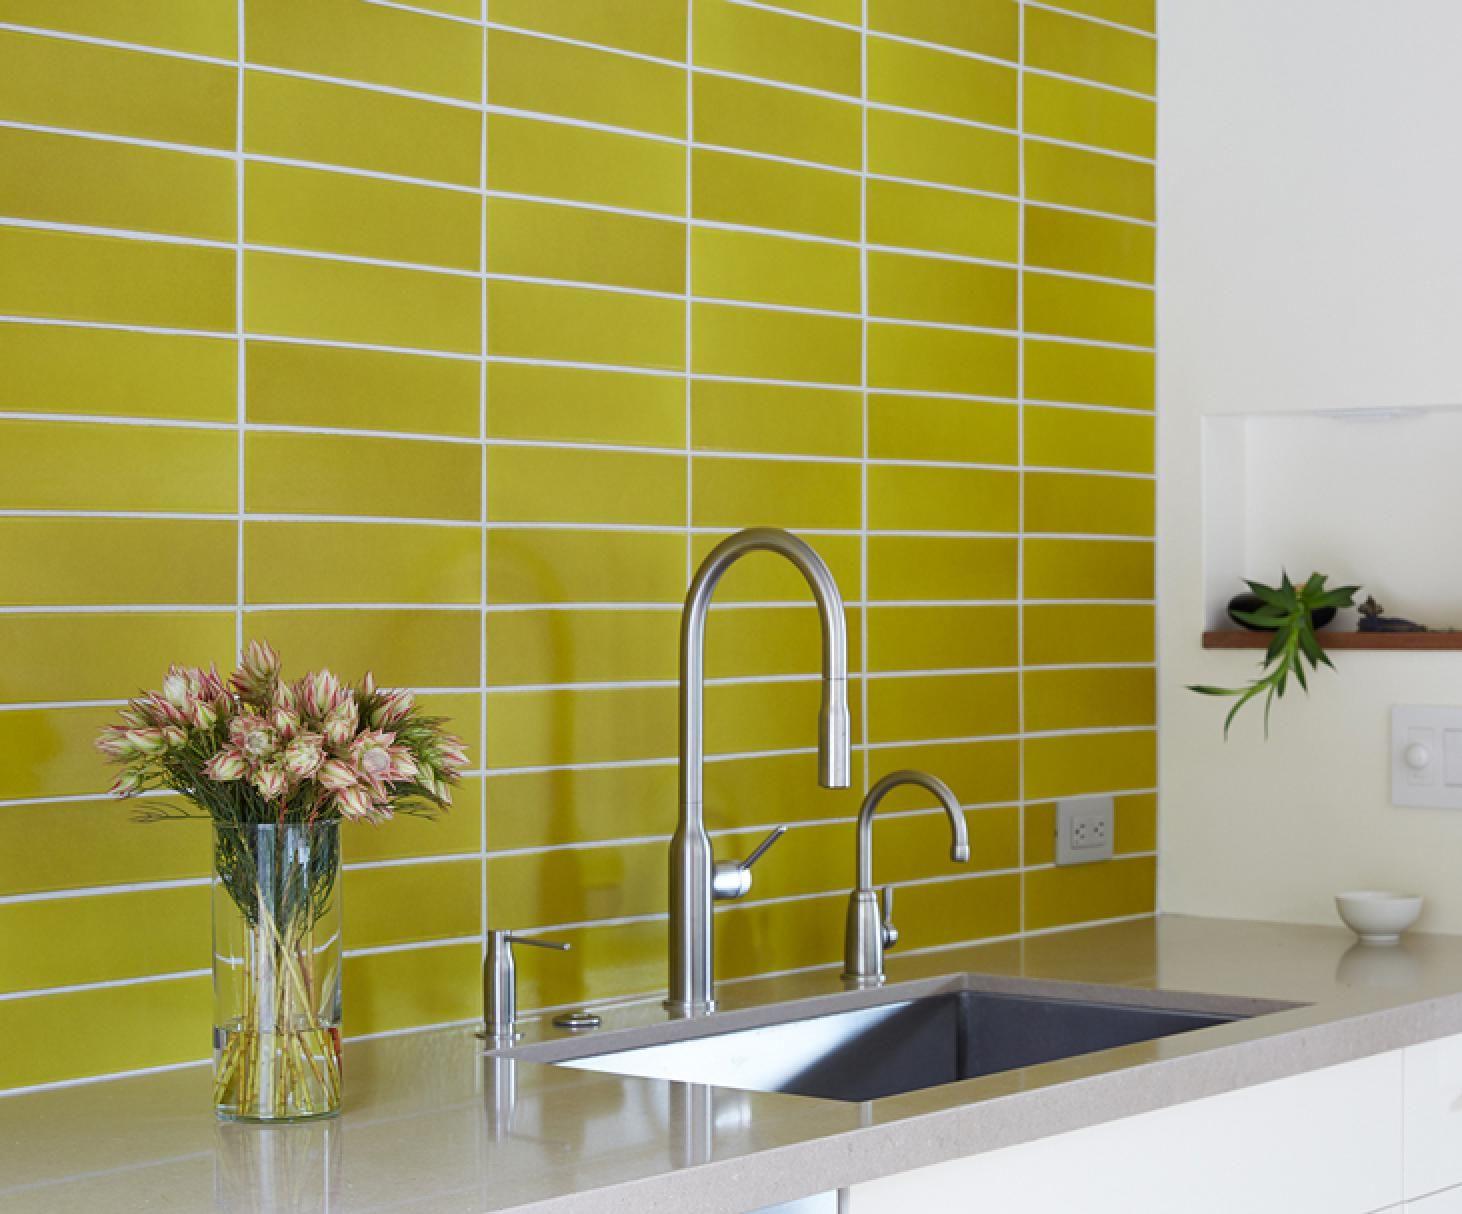 Heath Ceramics 3x12 Classic Field Tile In G44 Bright Yellow Photo